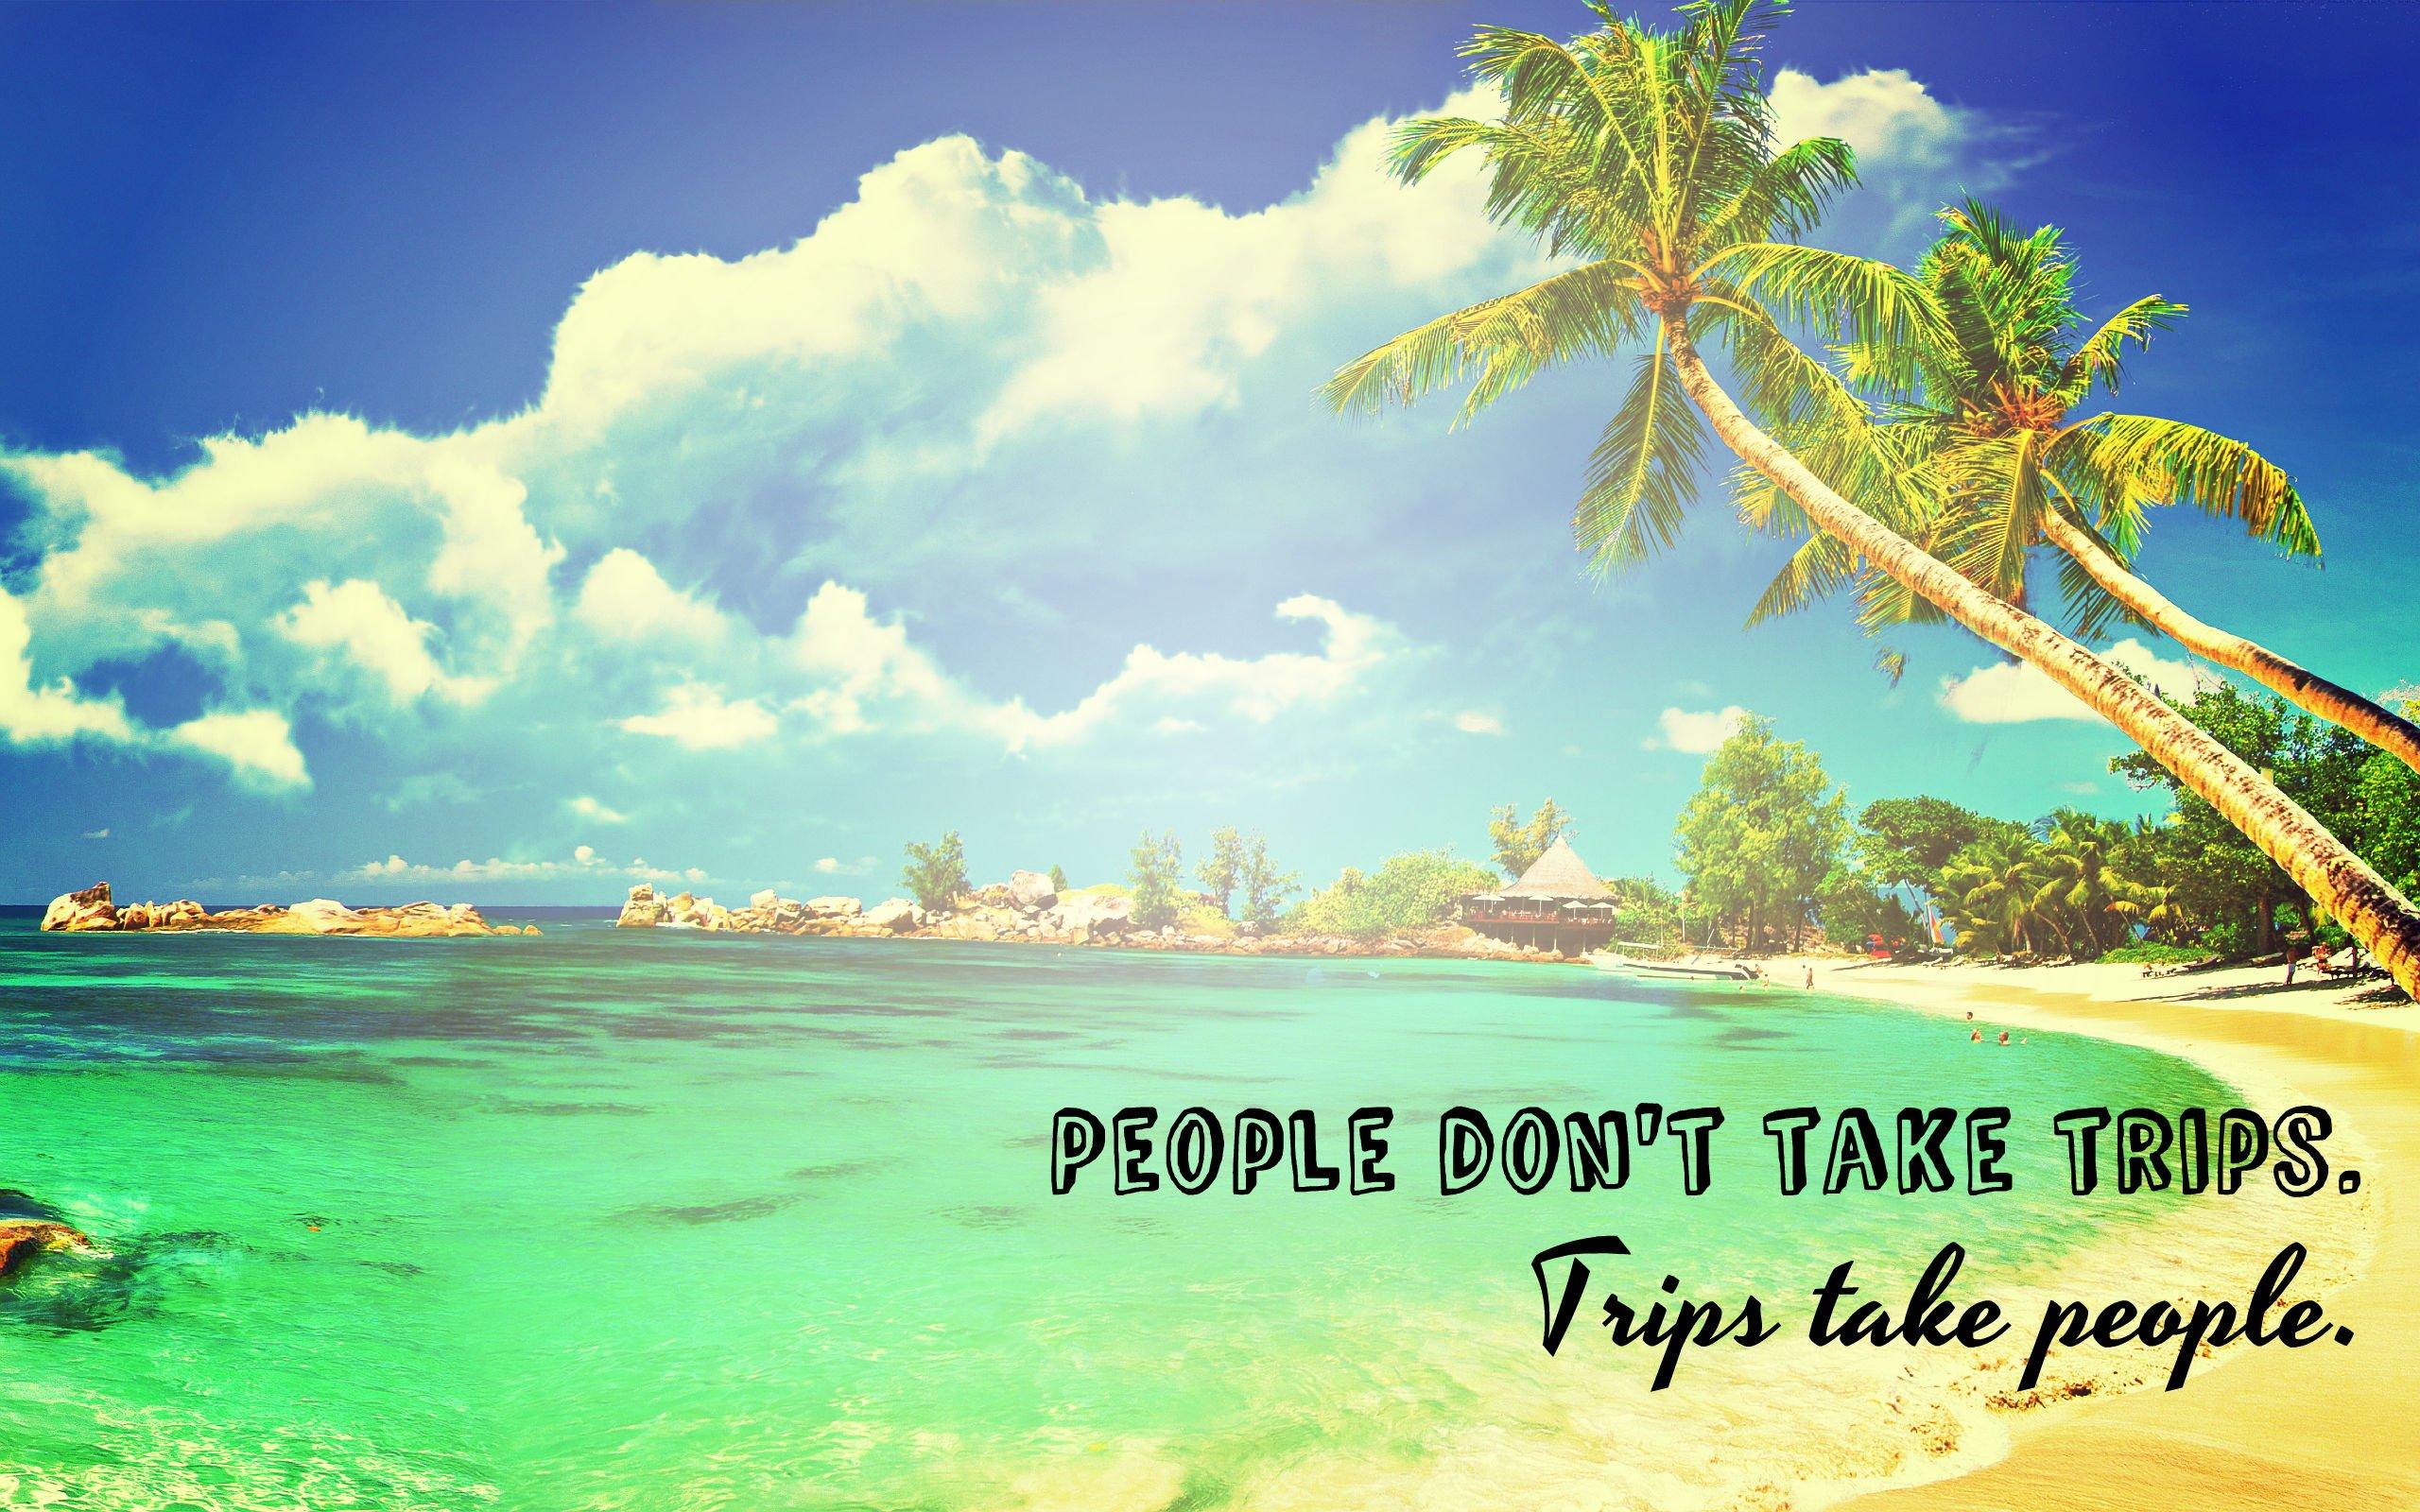 Travel quotes (4)